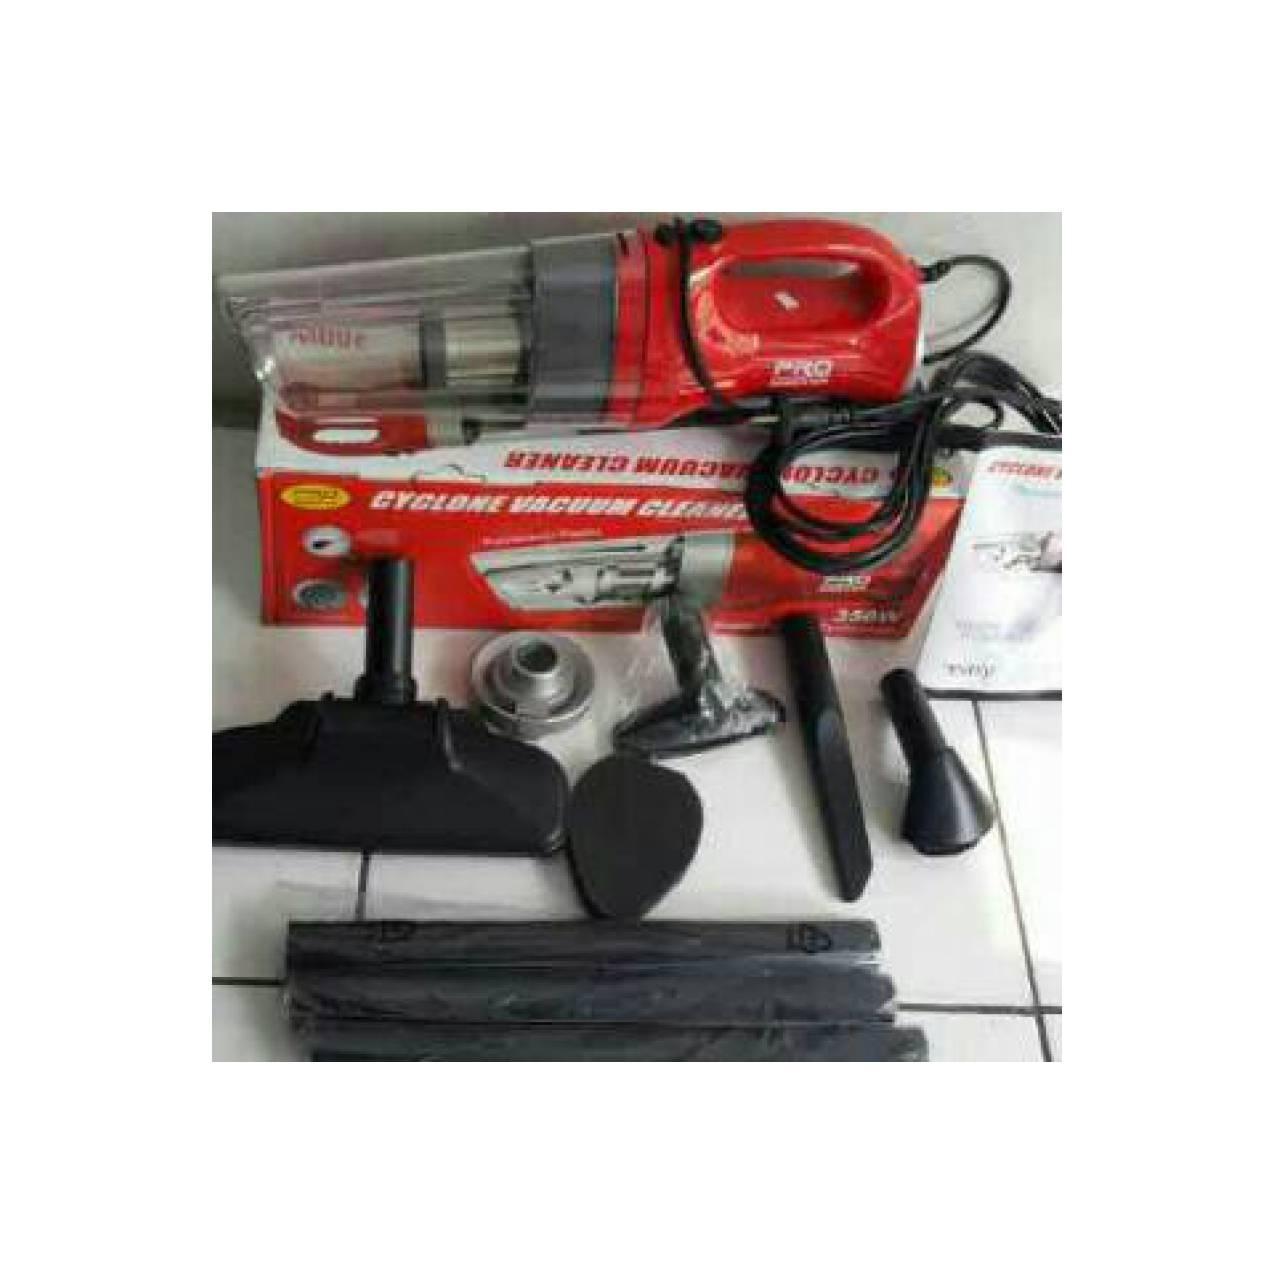 vacum cleaner pro master ez hoover cyclone, vacuum cleaner murah